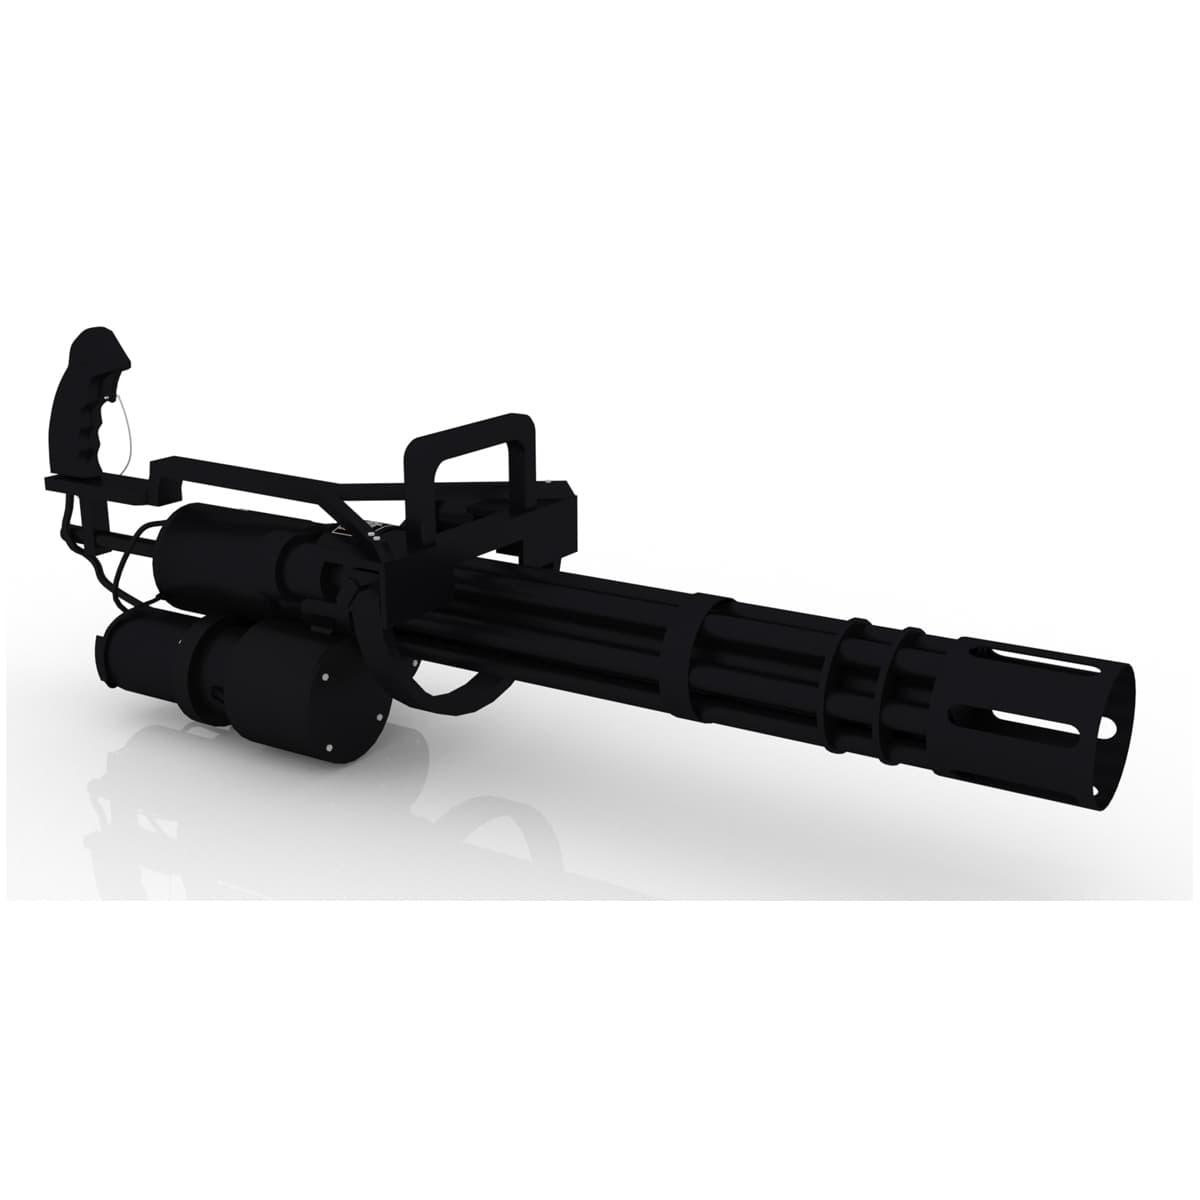 3d model classic m134 minigun